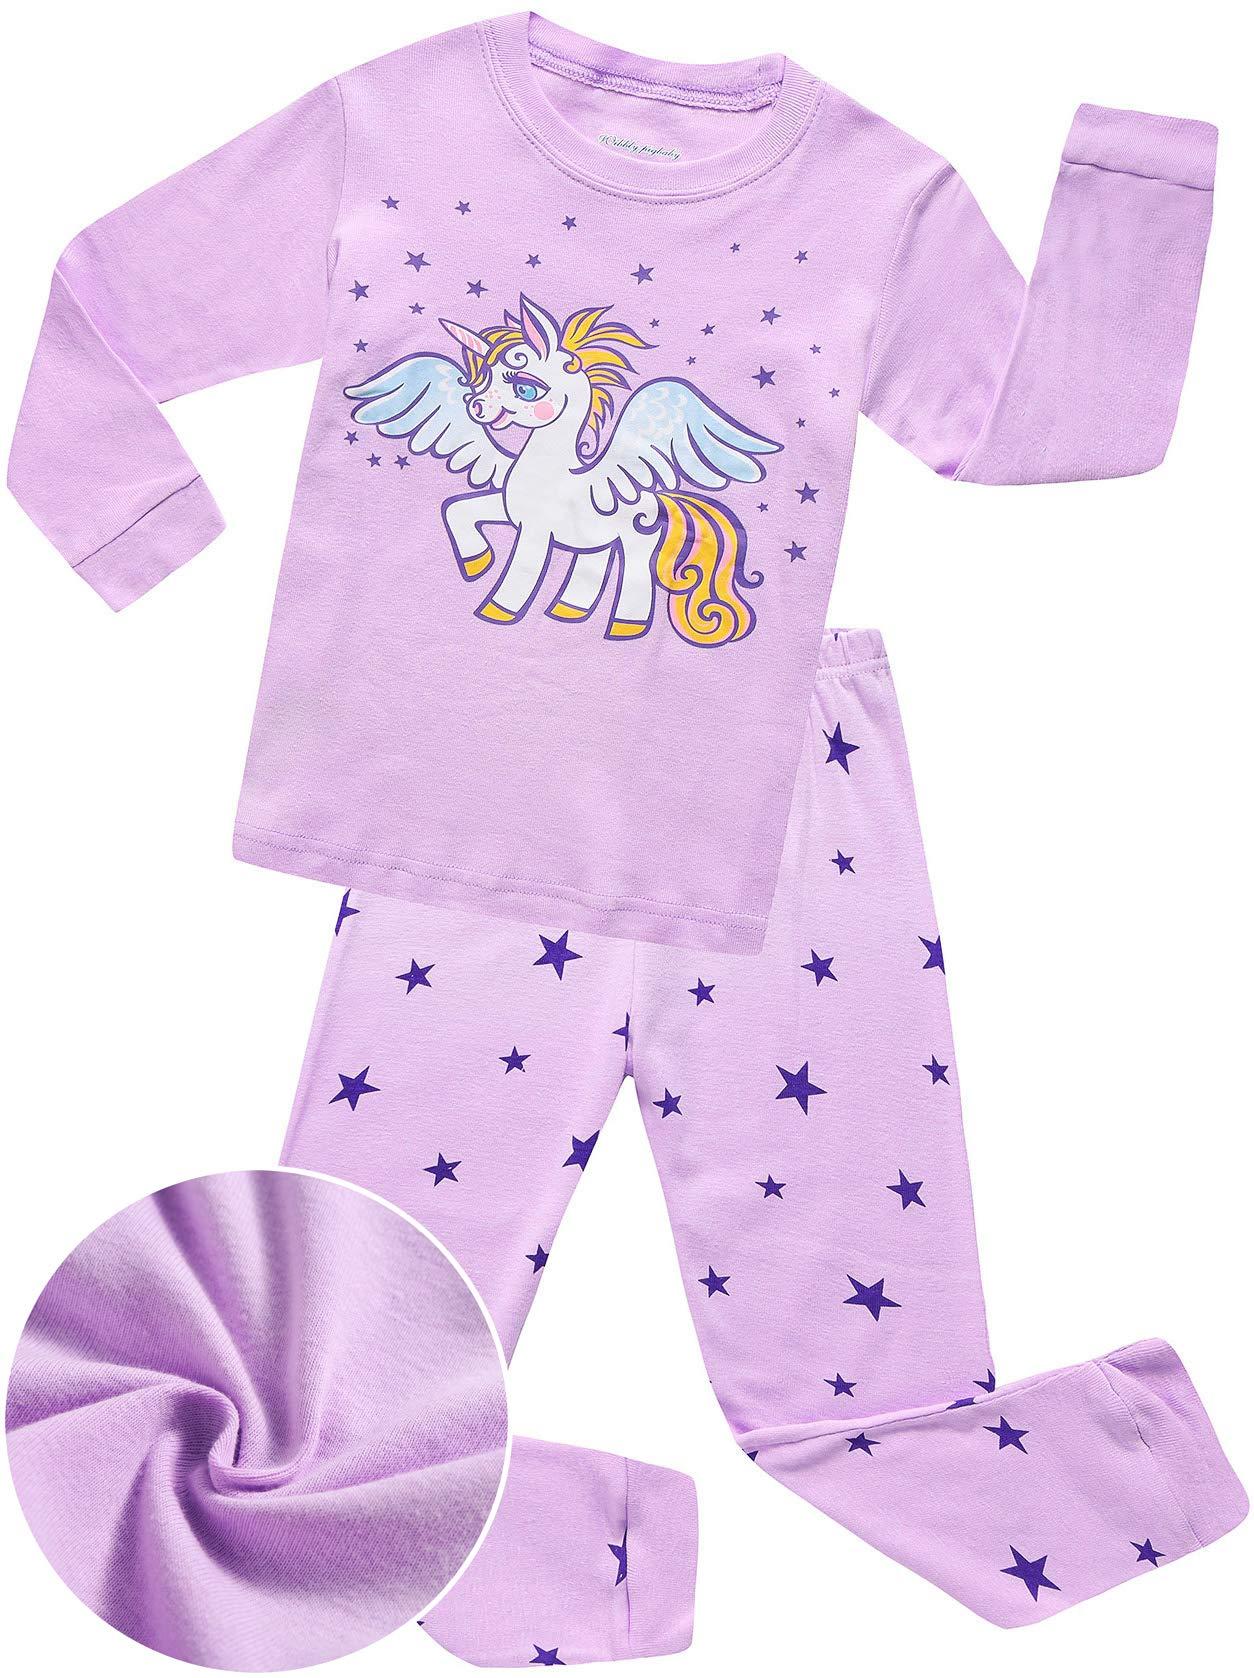 ANTSANG Toddler Girls Purple Unicorn Pajamas Long Sleeve Sleepwear Paj Set Kids Little Cute Cotton Clothes Children (Unicorn, 4T)